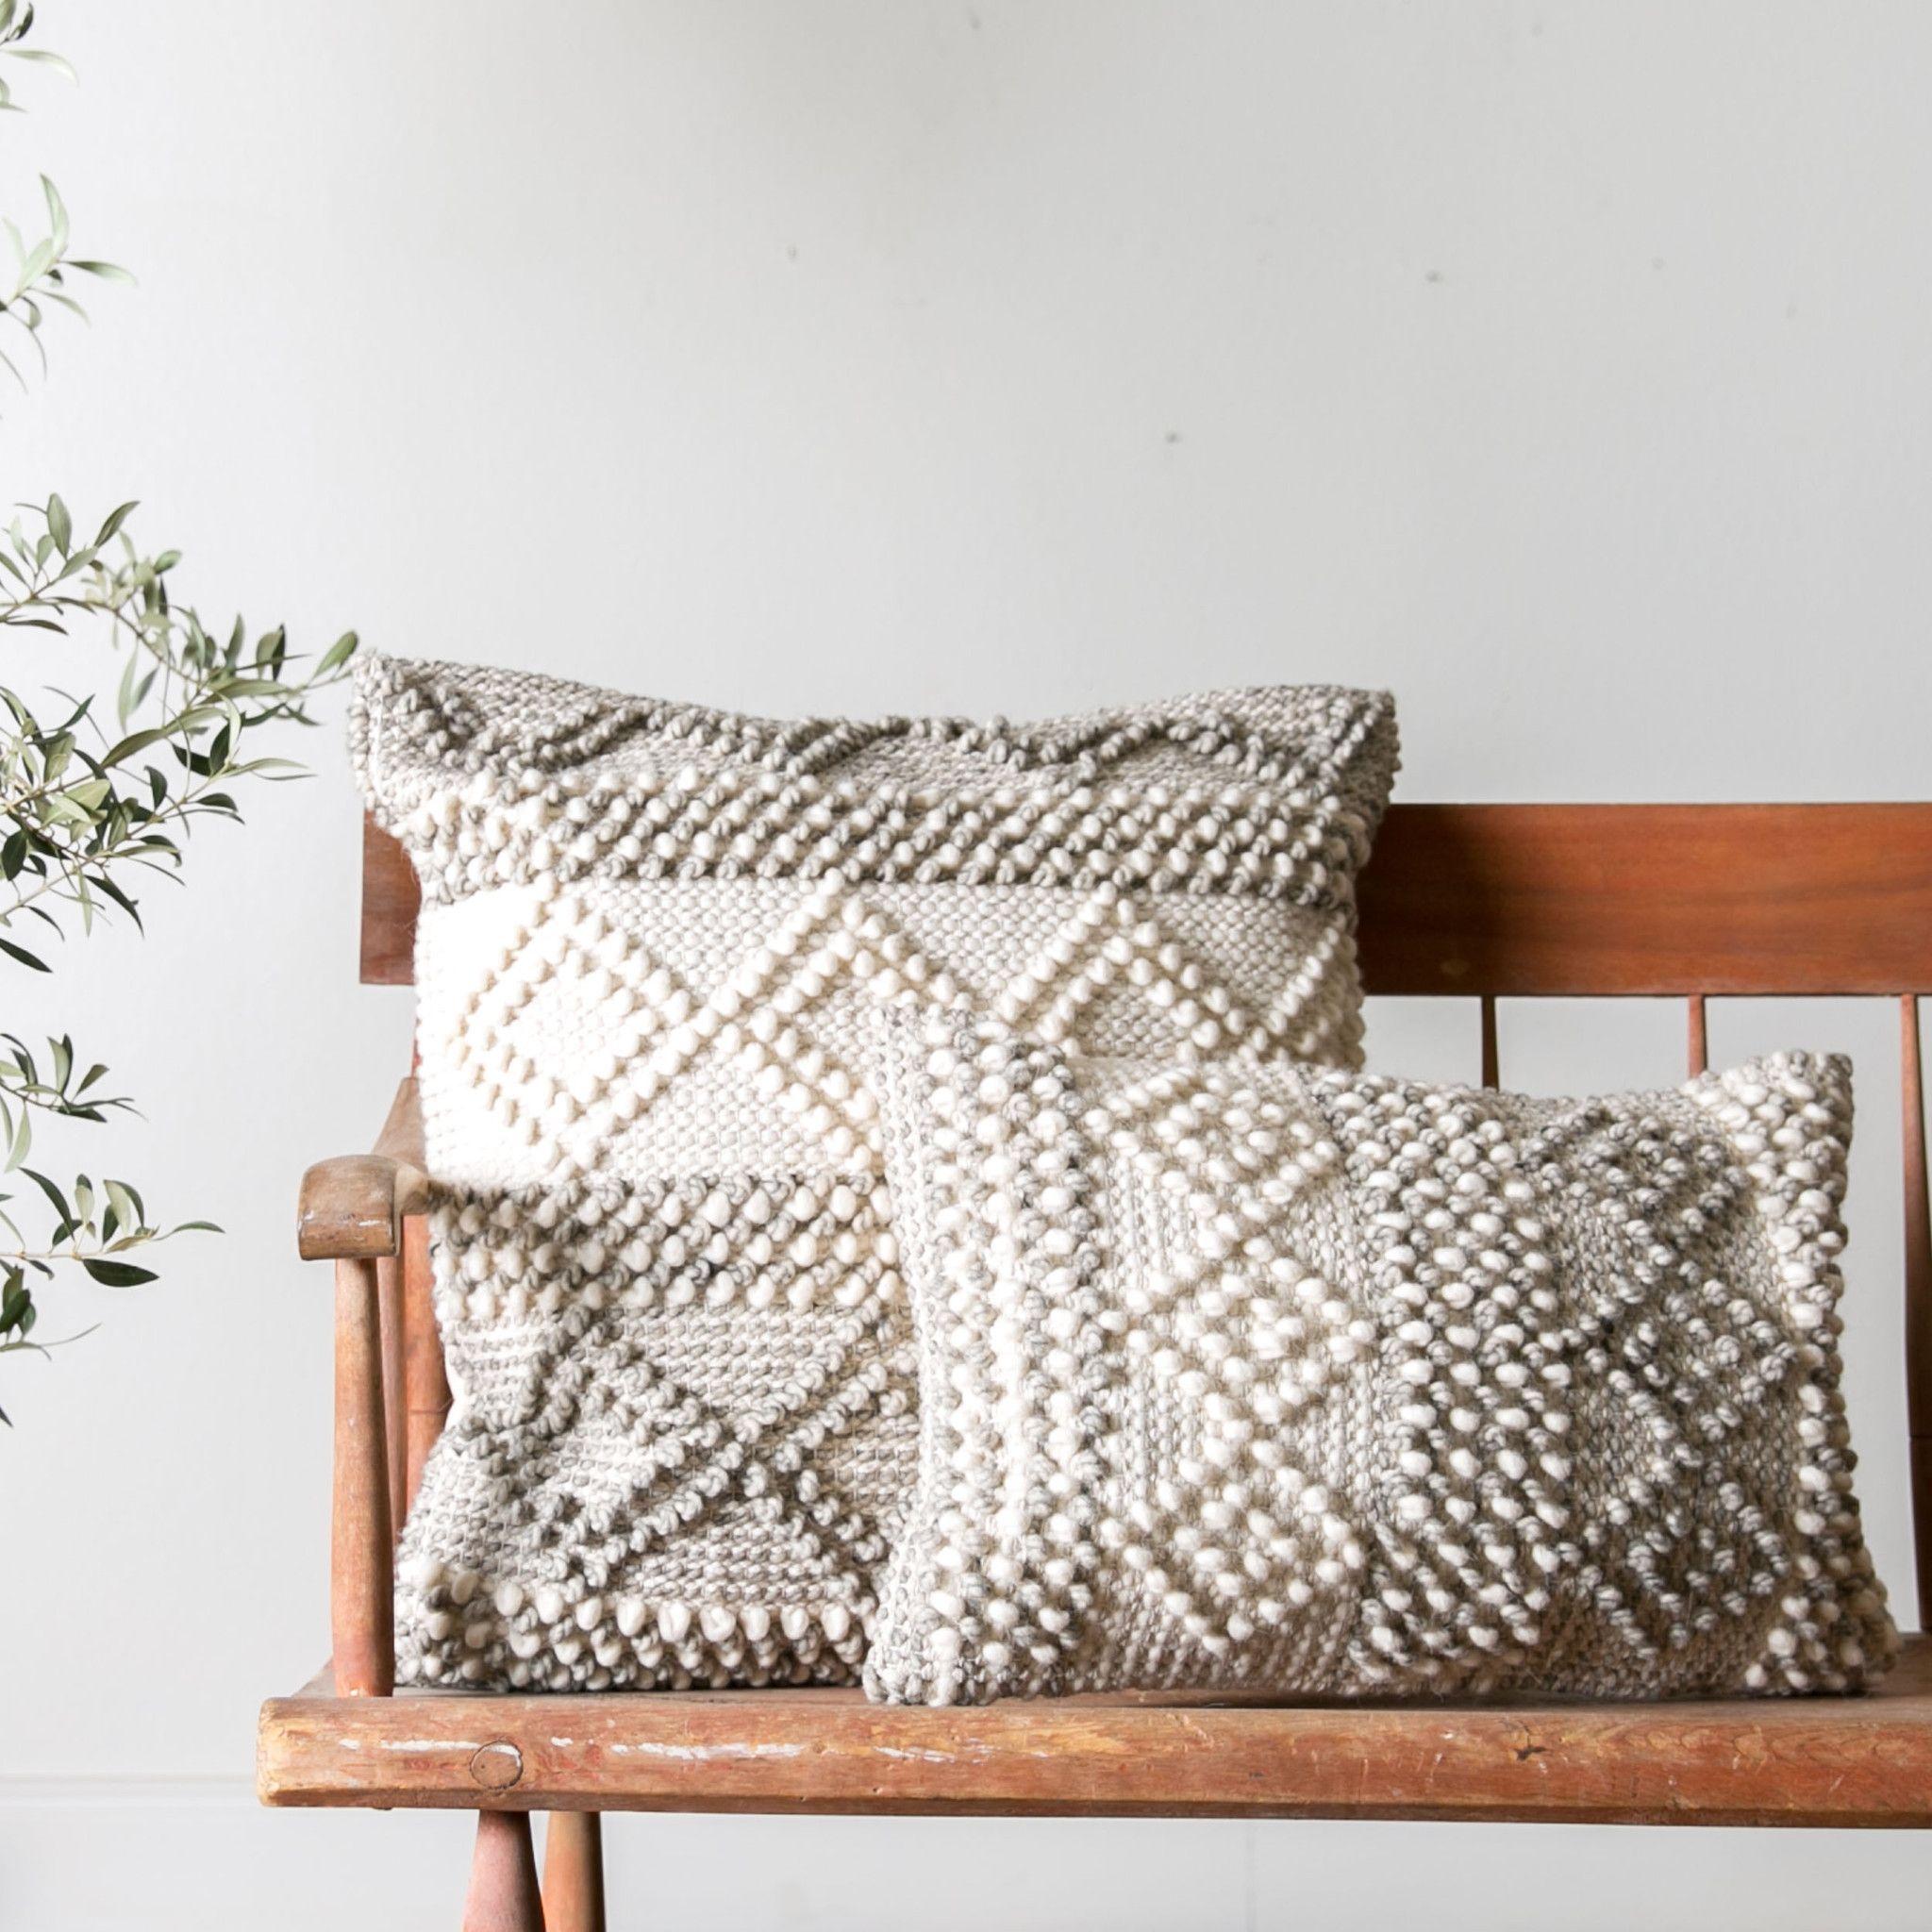 Joslin Pillow : Magnolia, Pillows and Crochet